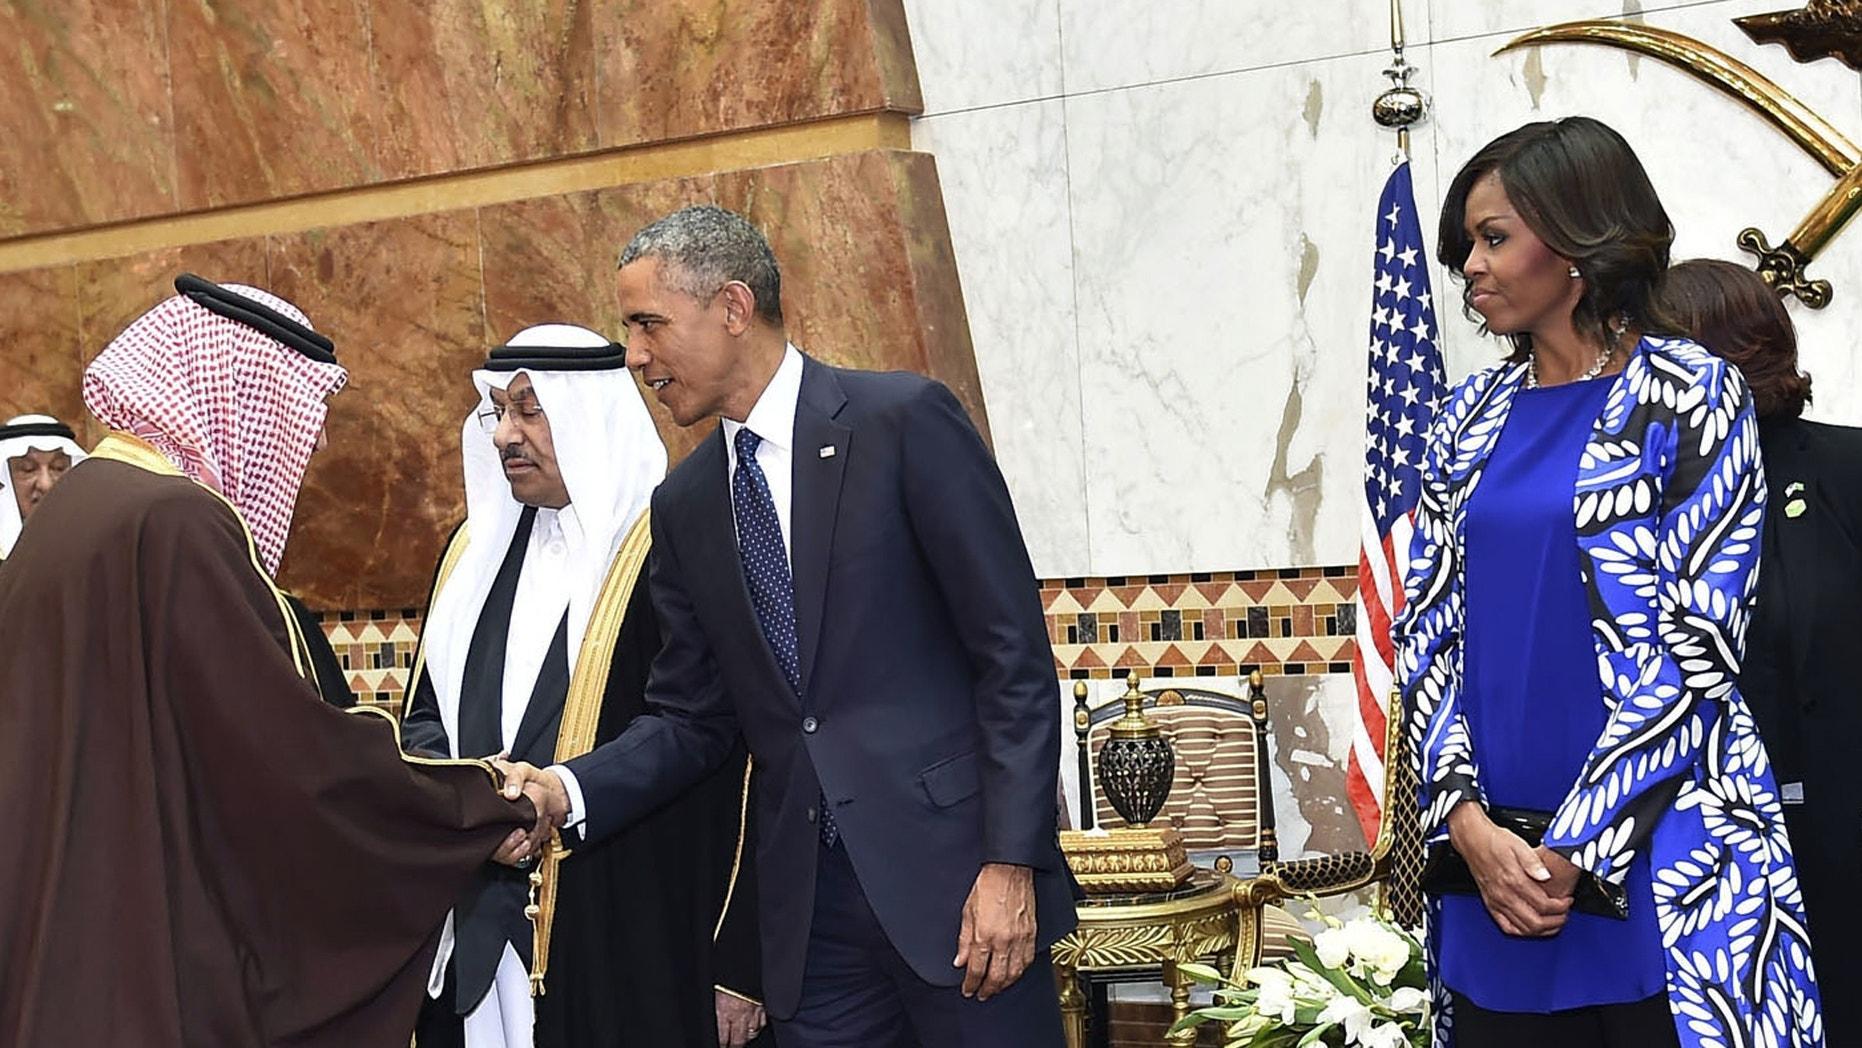 President Obama and first lady Michelle in Riyadh, Saudi Arabia, Tuesday, Jan. 27, 2015.